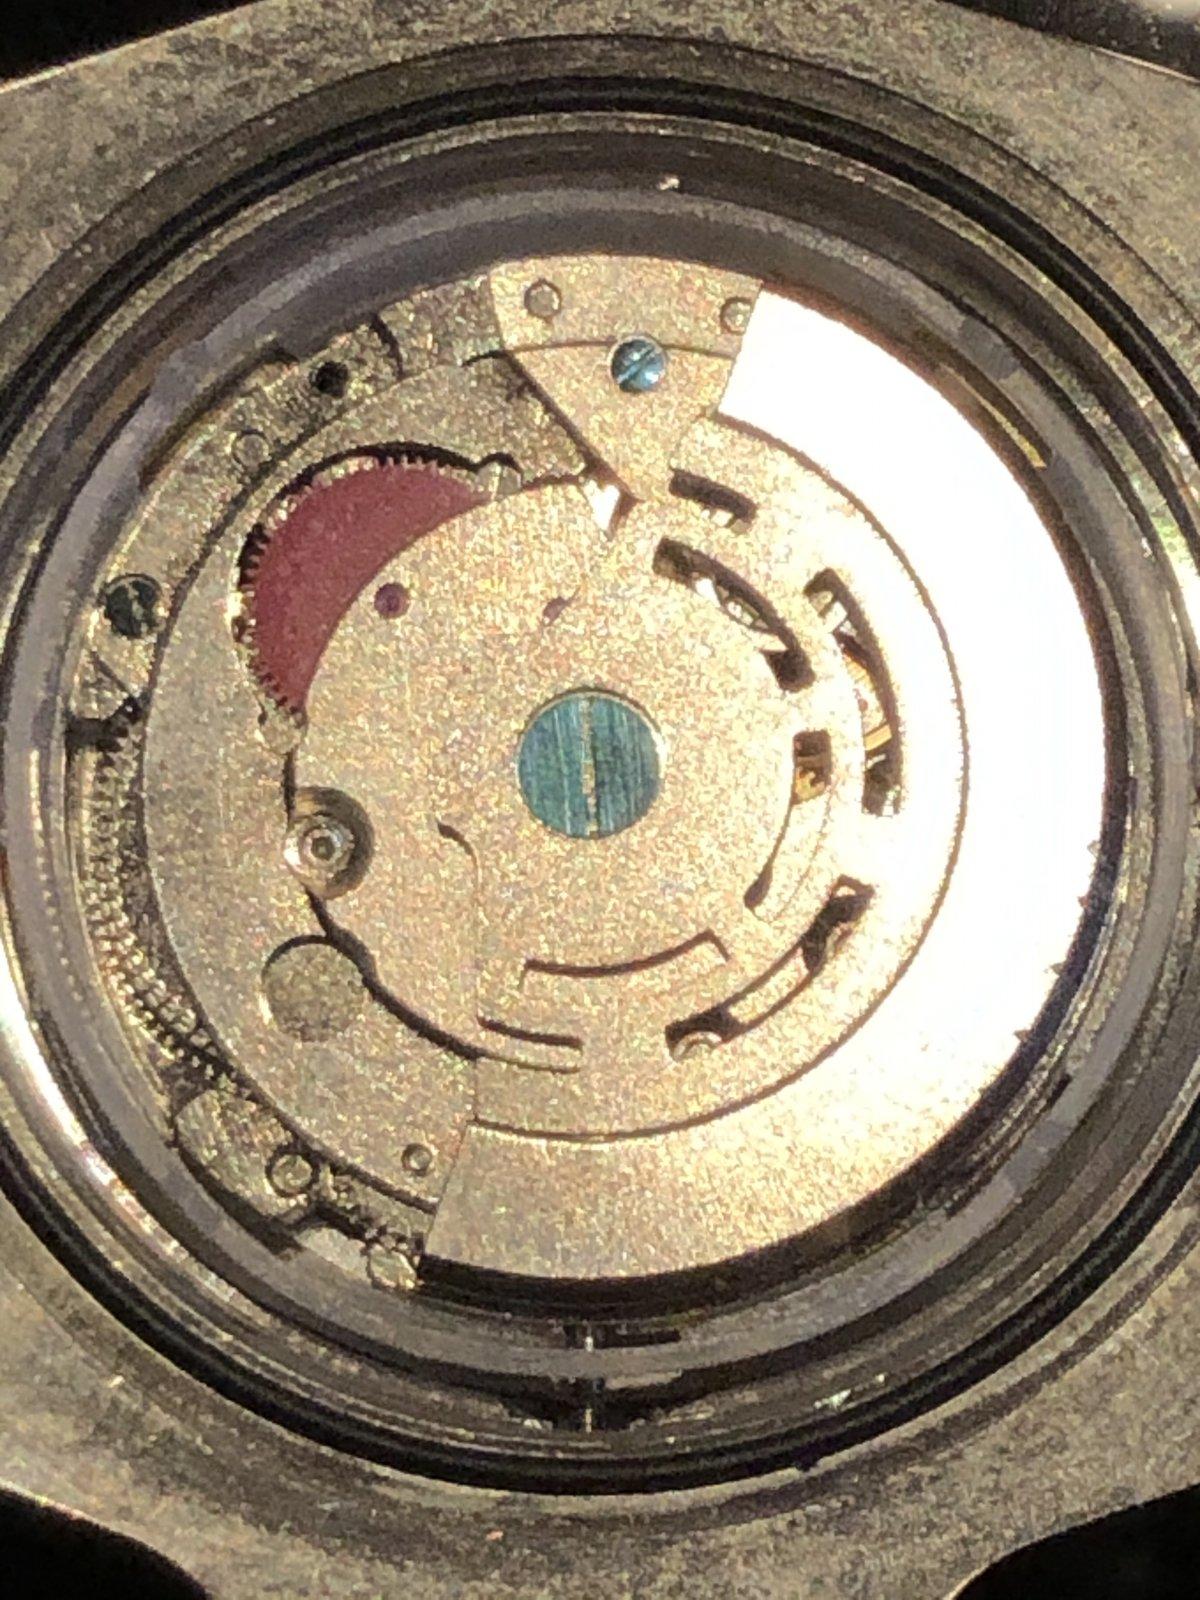 1B7CF5D0-238C-41CB-ADB0-30C388376C1A.jpeg